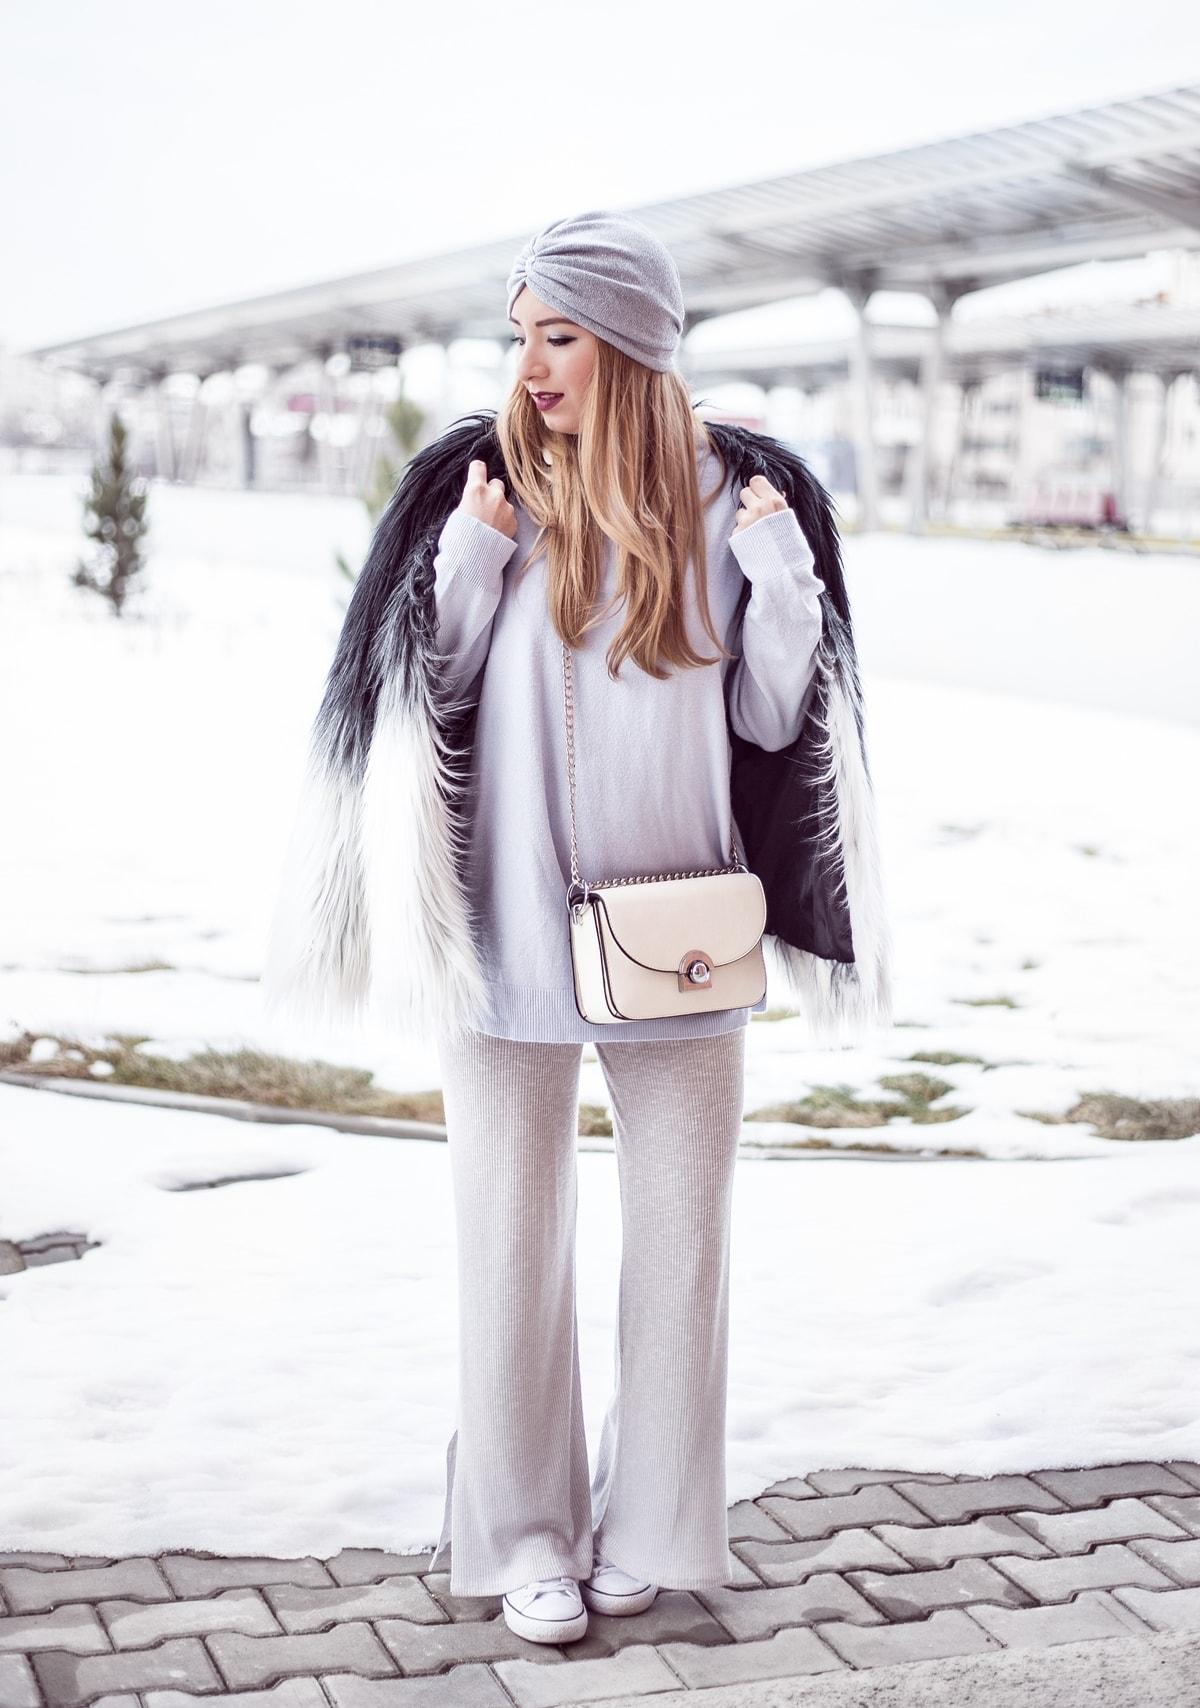 Tinuta cu stil, iarna, jacheta blana artifciala alb negru, pantaloni din tricot gri, tinuta lejera, turban accesorizat, lune.ro, andreea ristea, blogger moda, pitesti